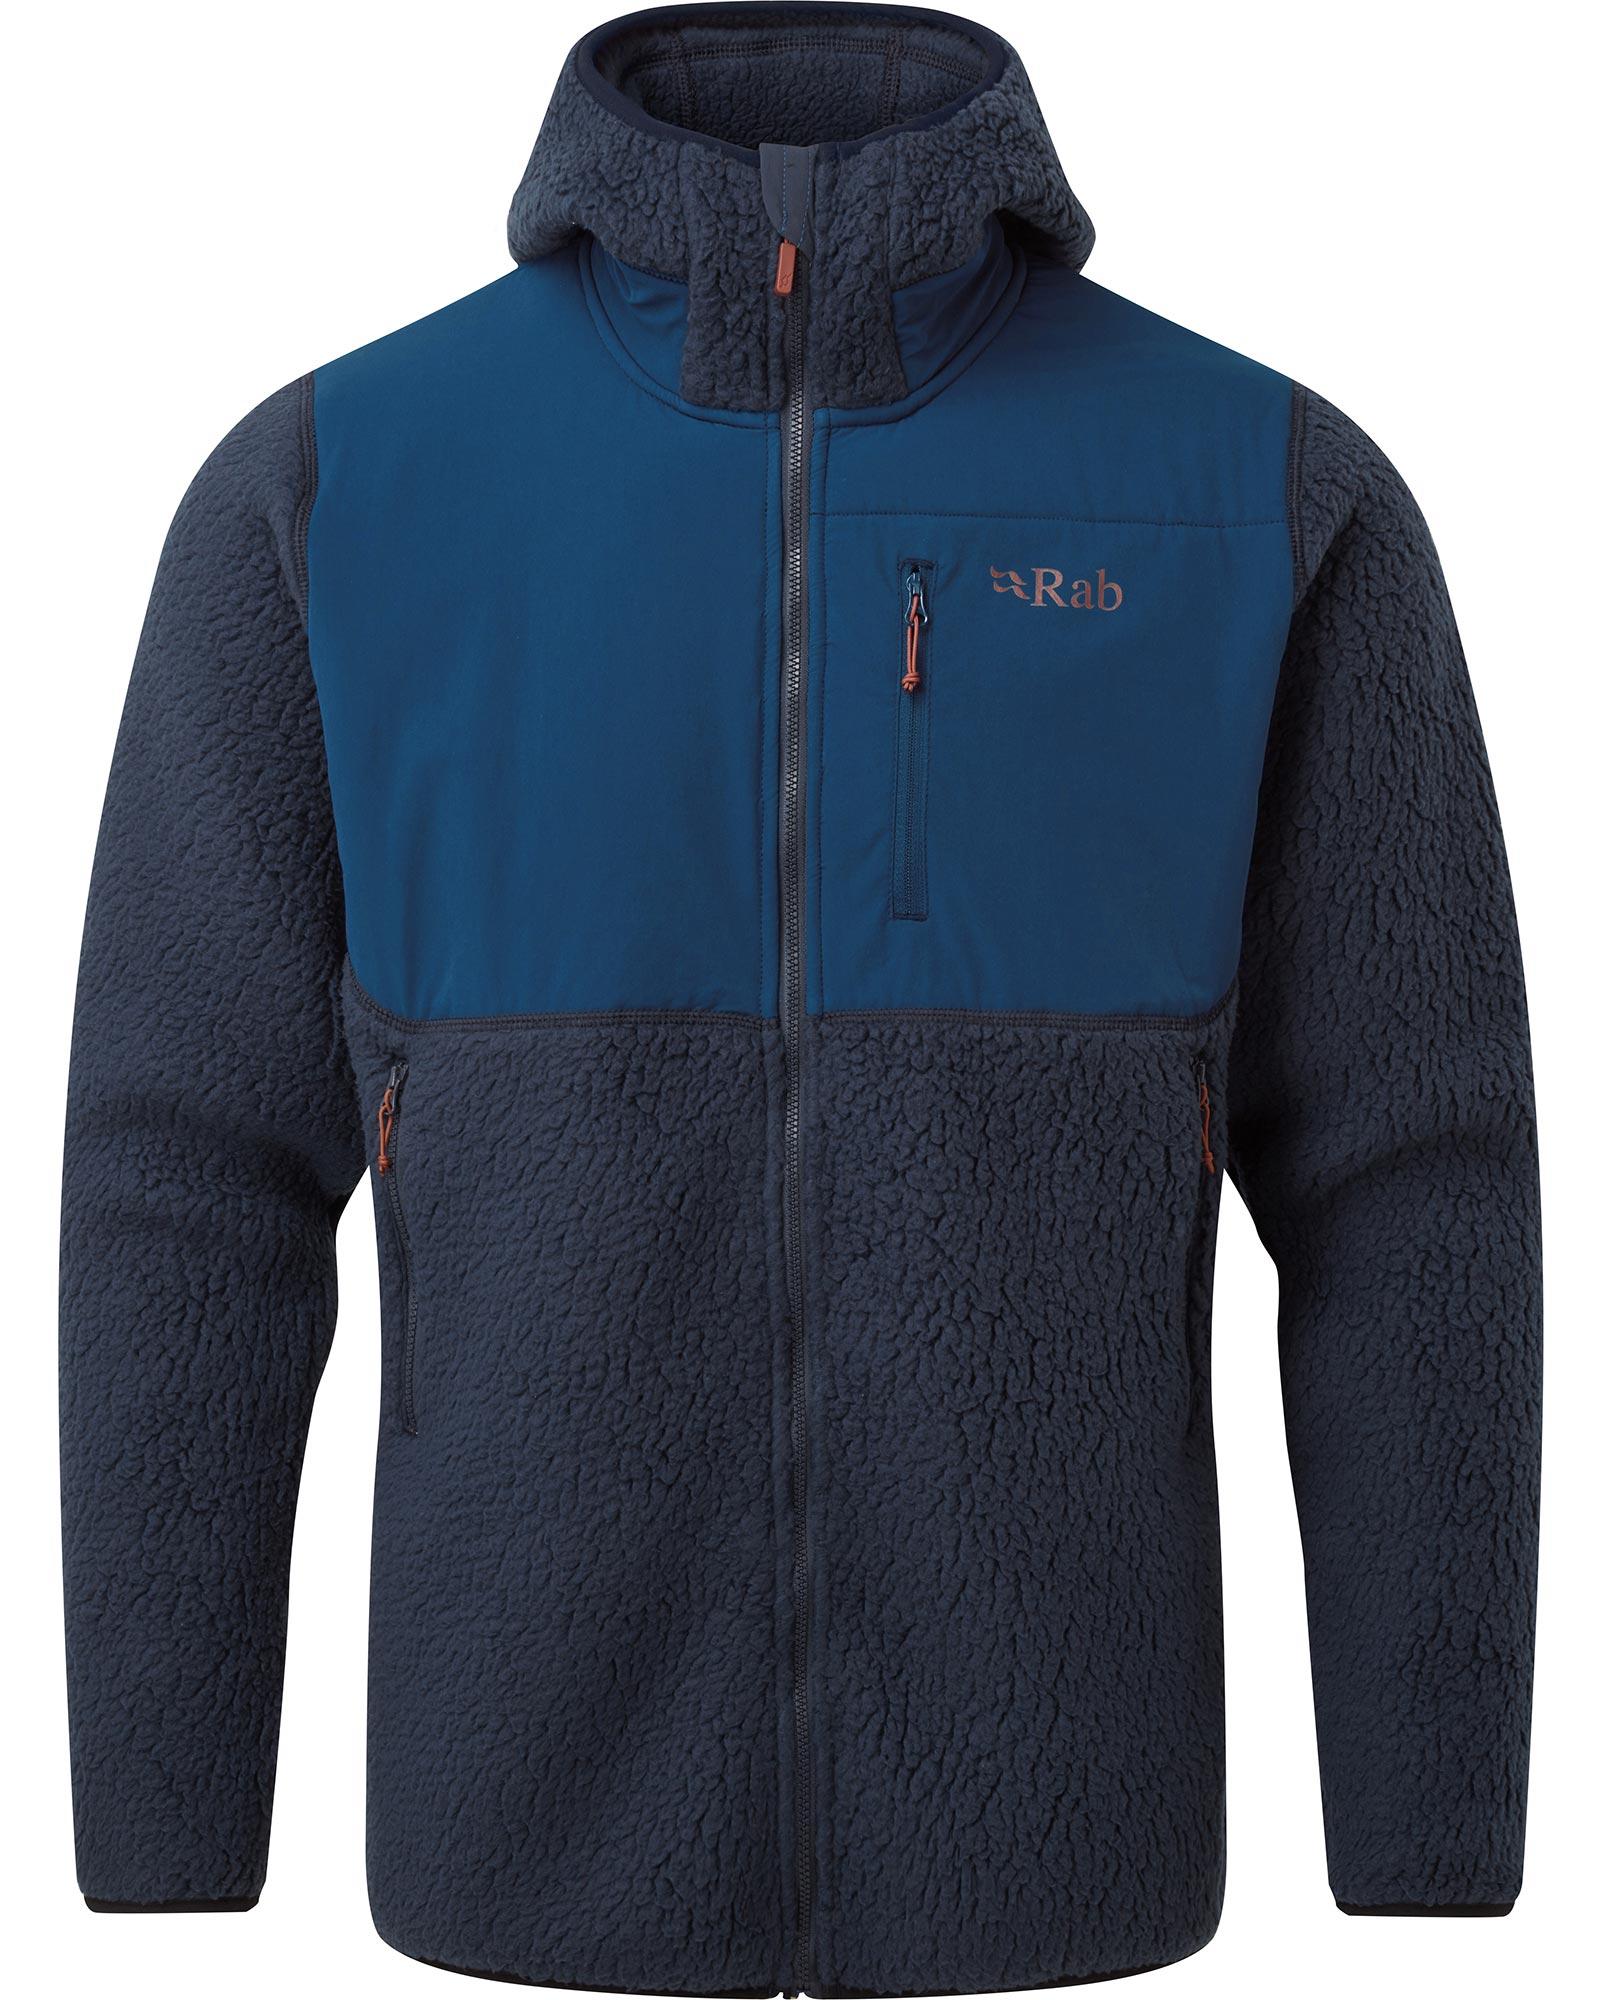 Rab Mens Strata Jacket